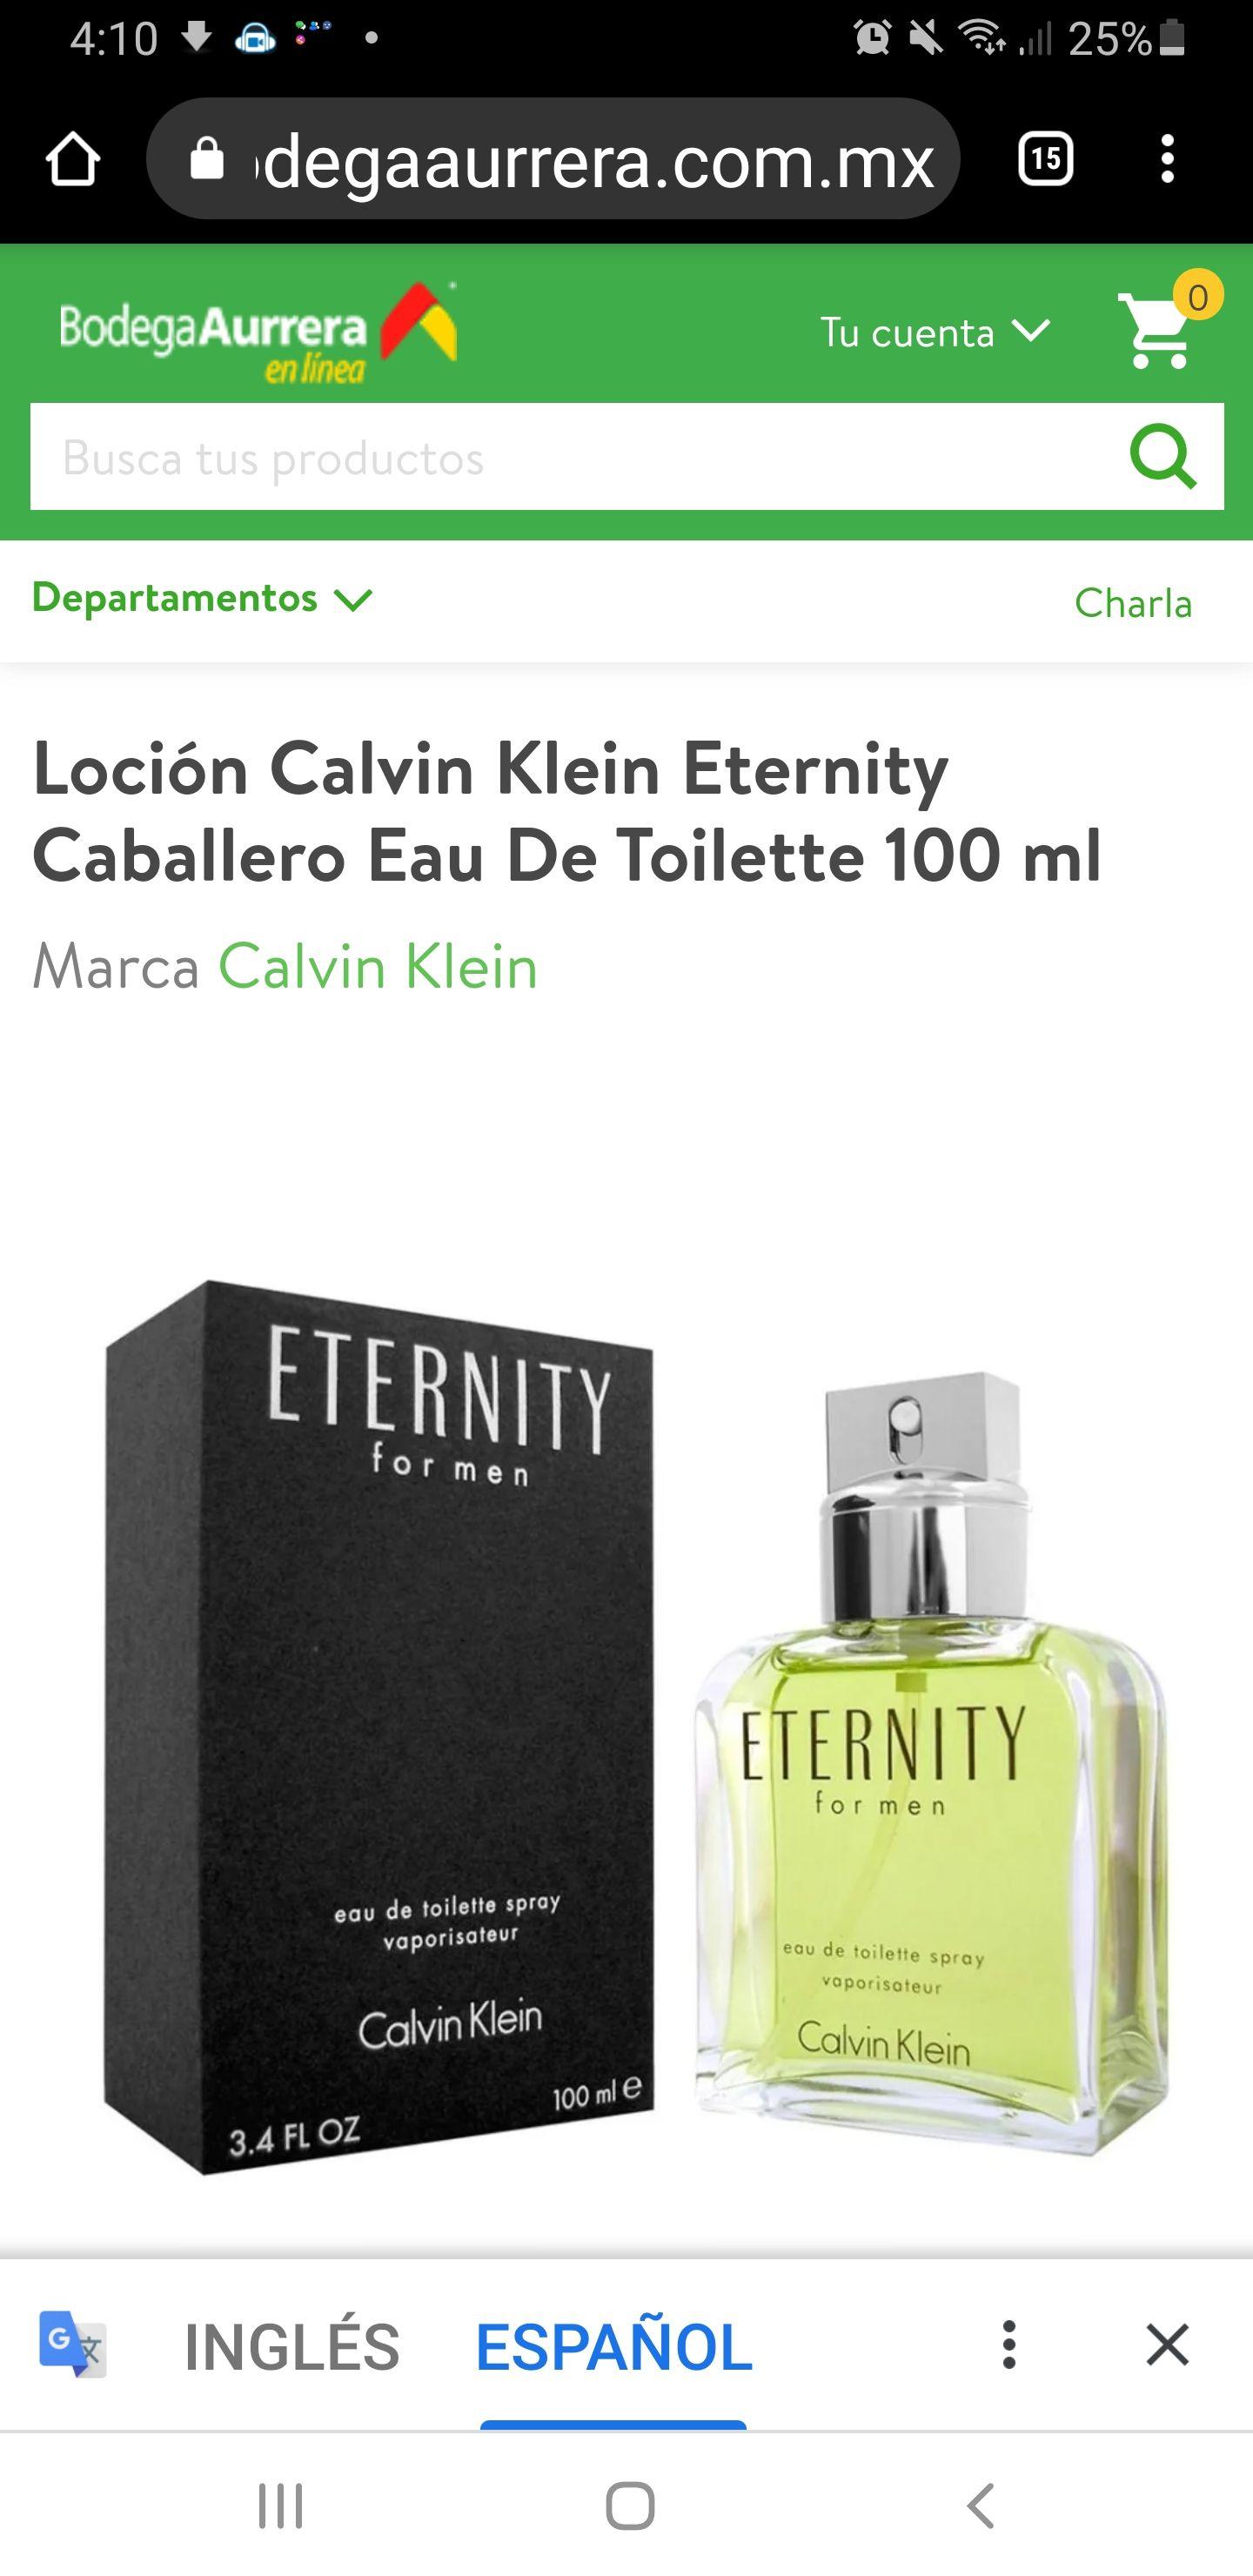 Bodega Aurrerá, Eternity para caballero